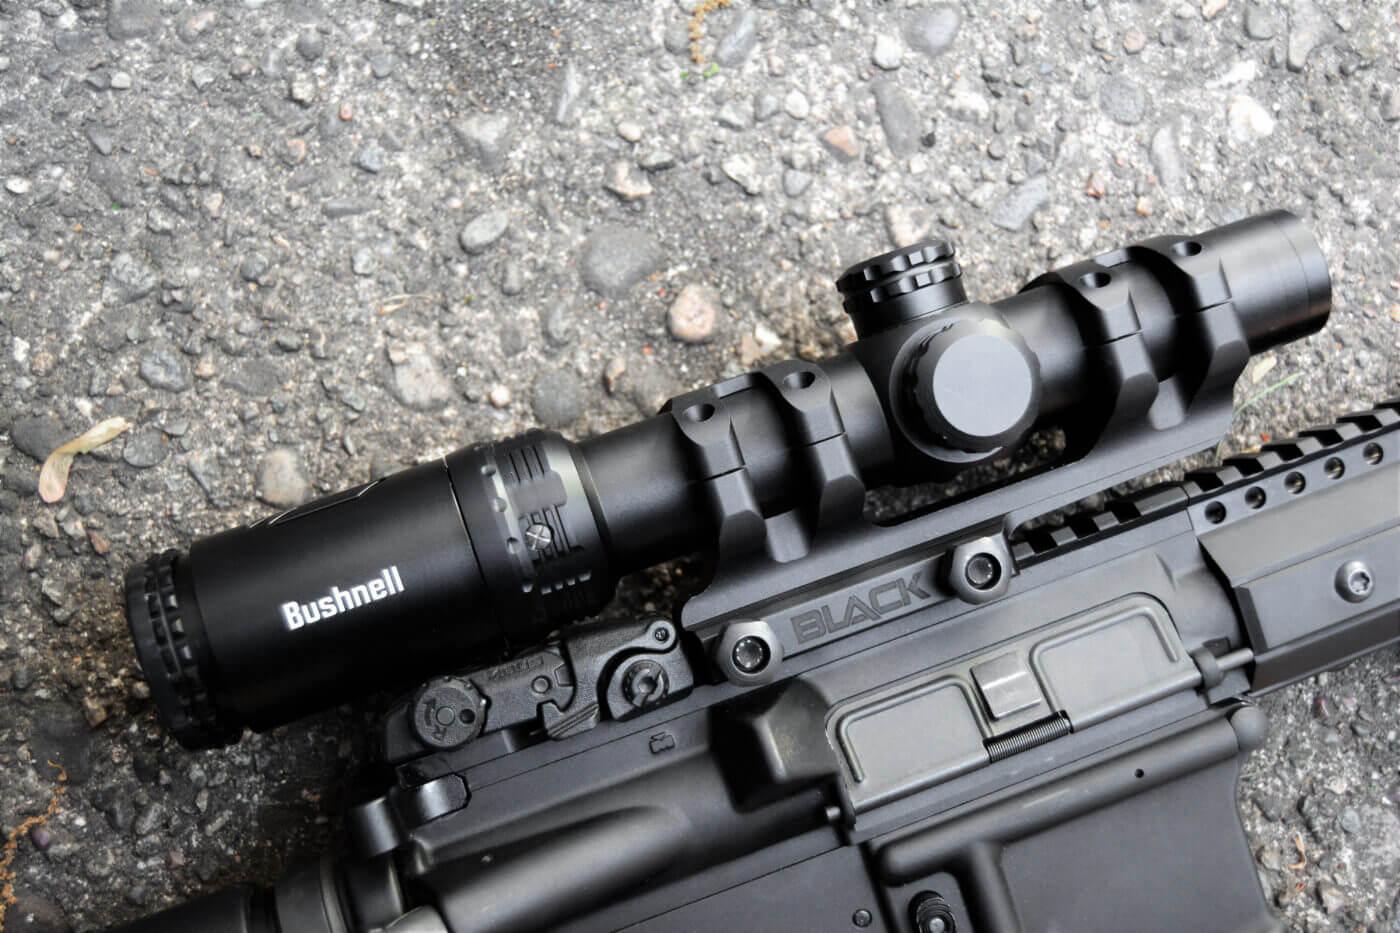 Bushnell AR Optics 1-8x24mm riflescope